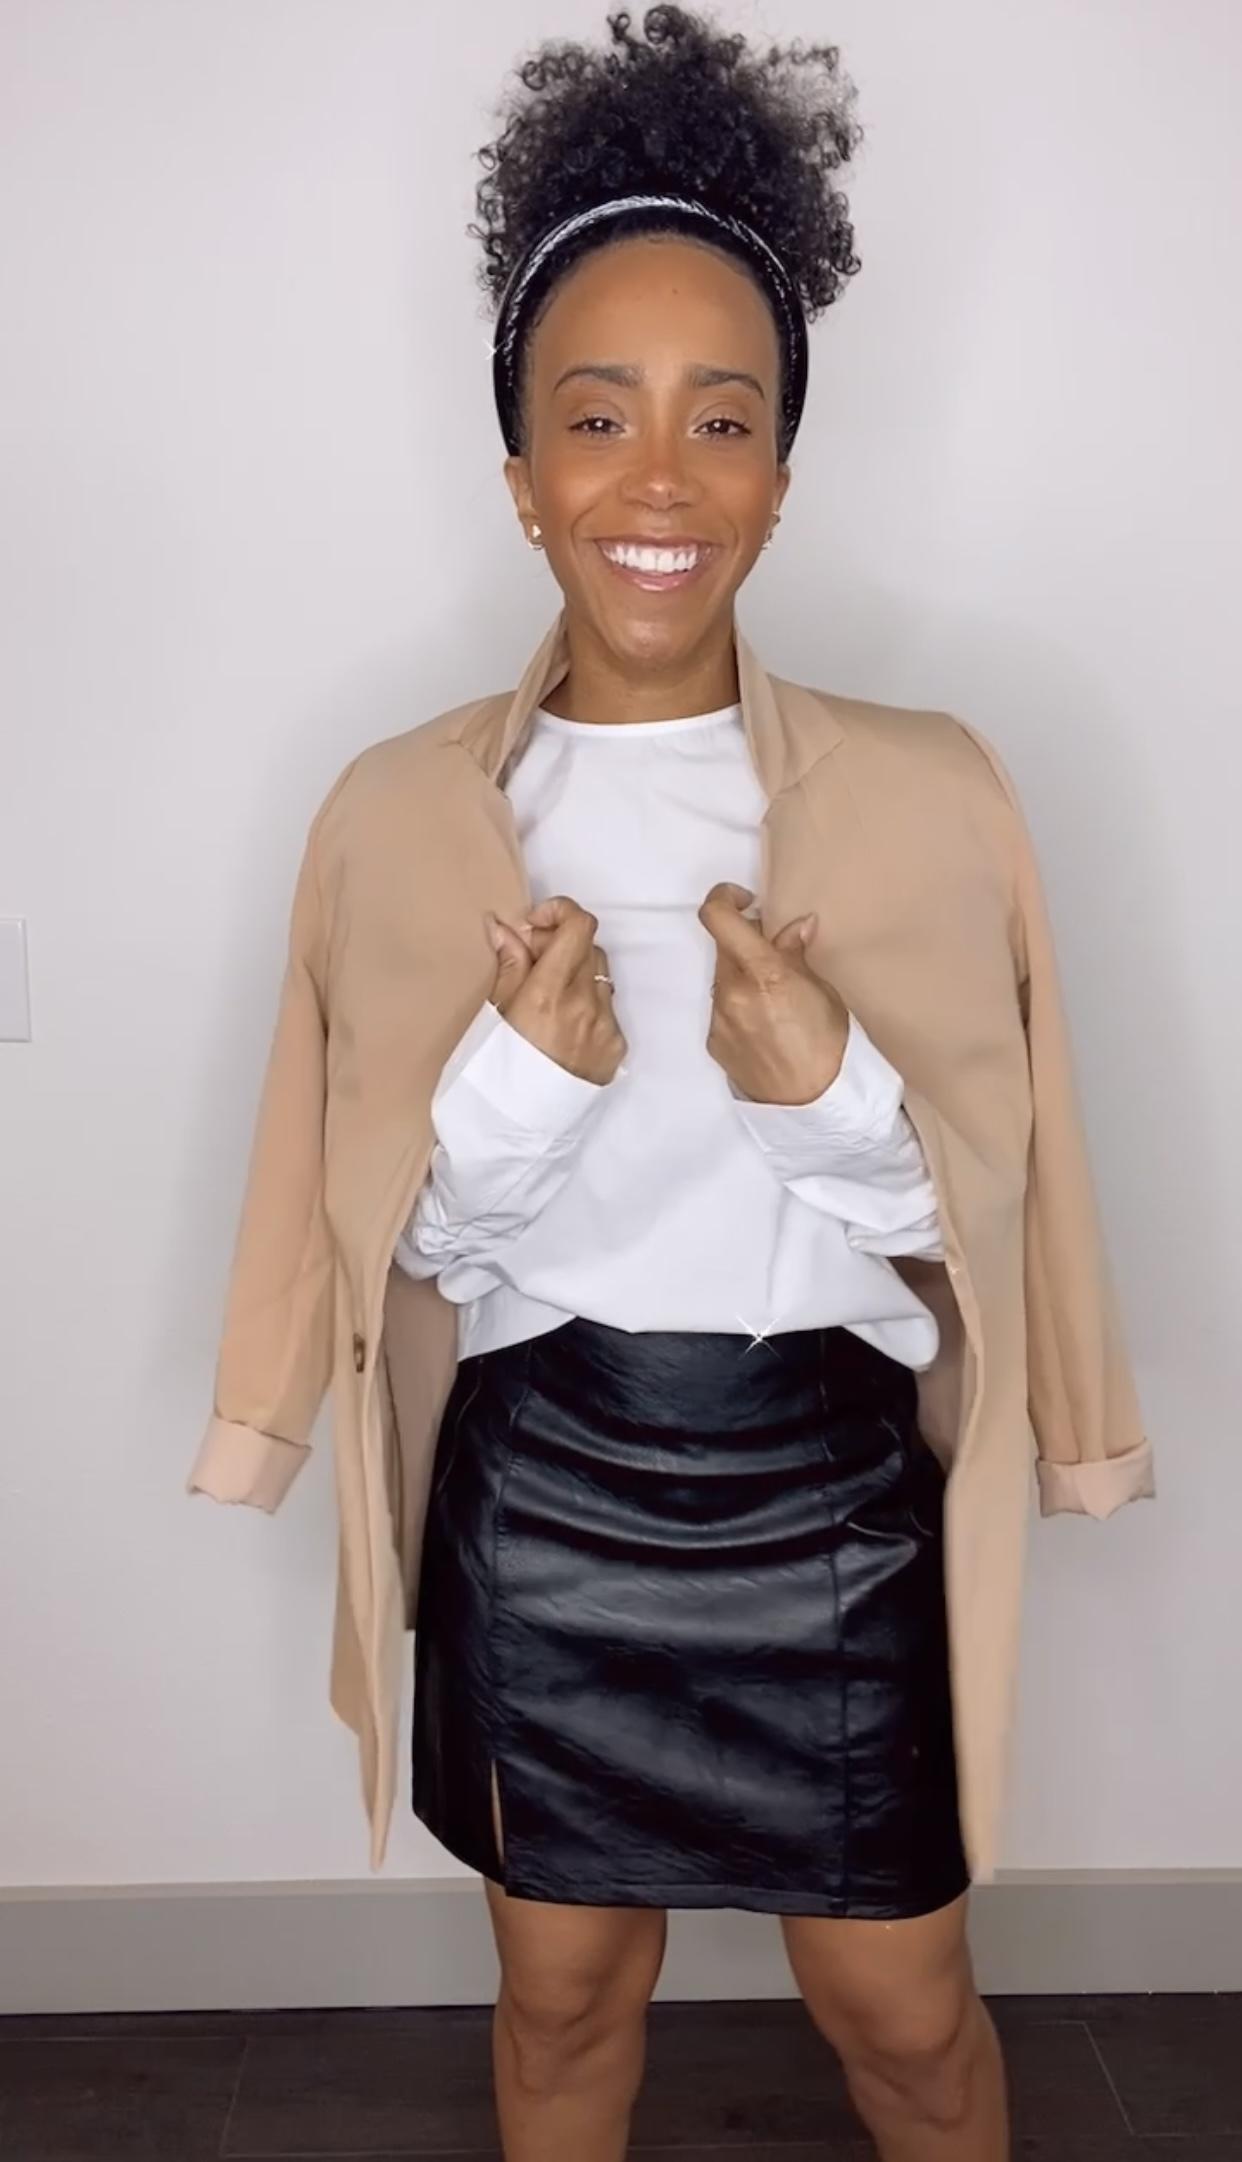 blazer outfit ideas